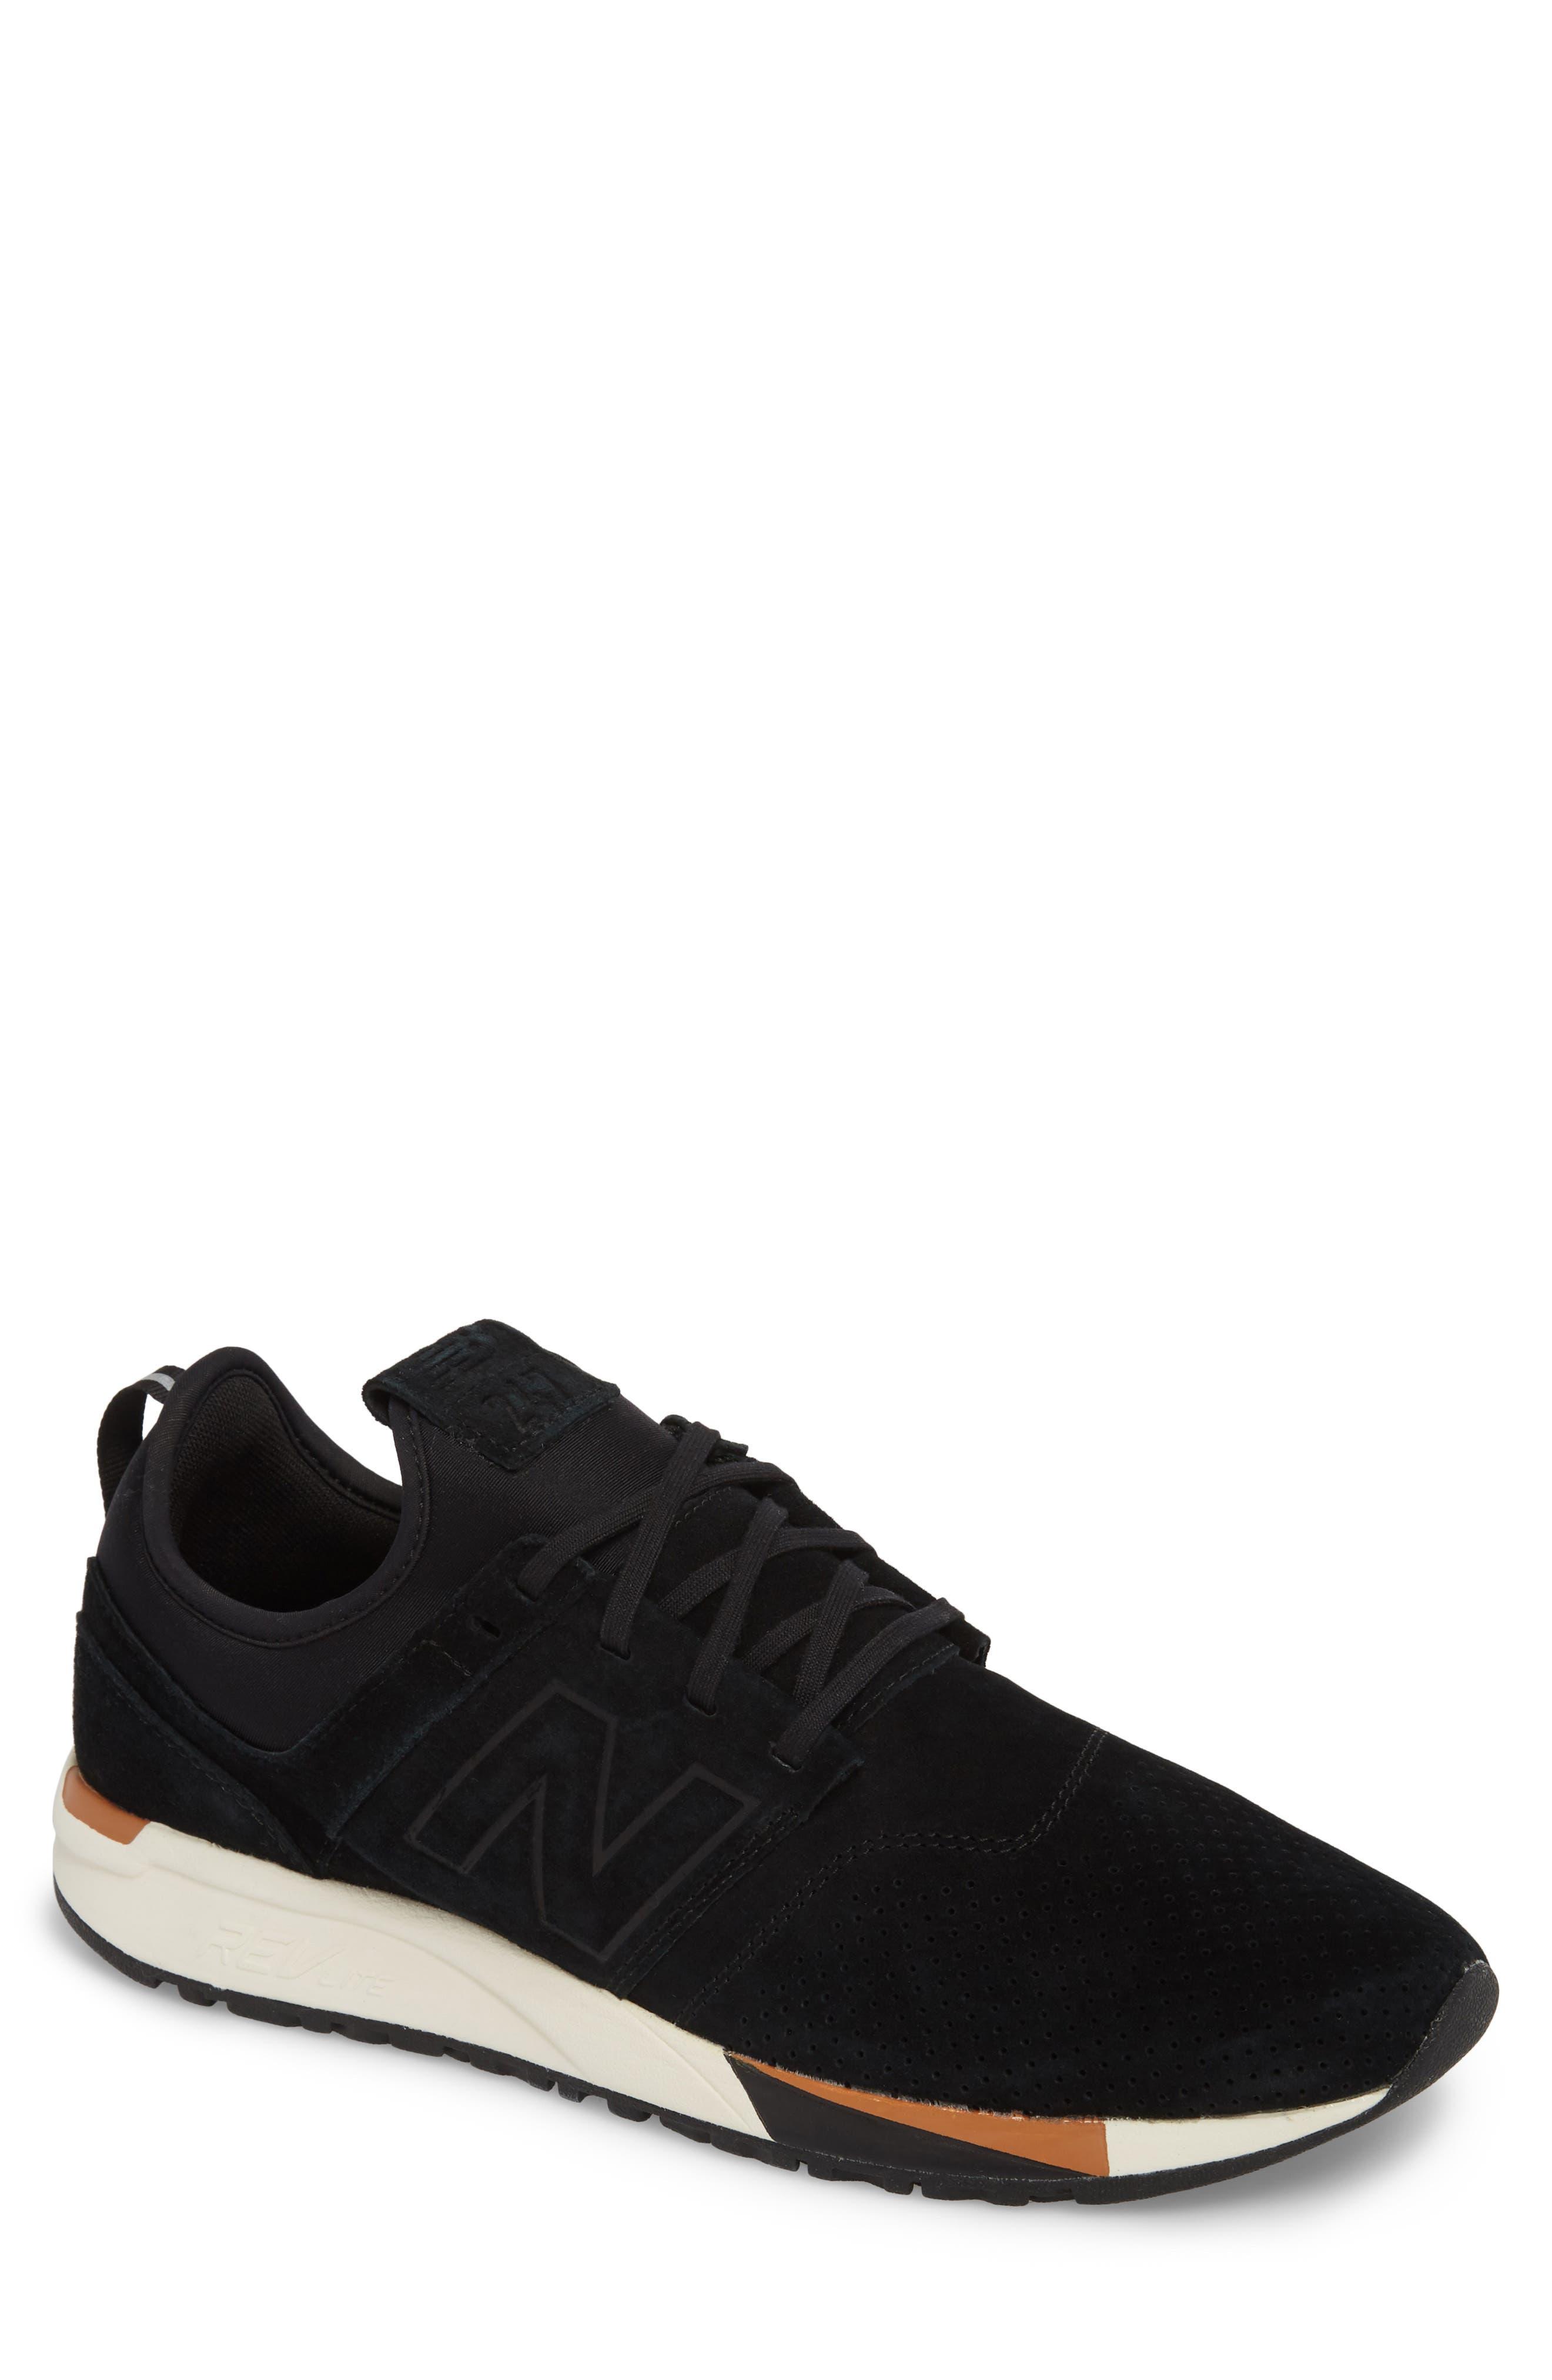 New Balance 247 Luxe Sneaker (Men)